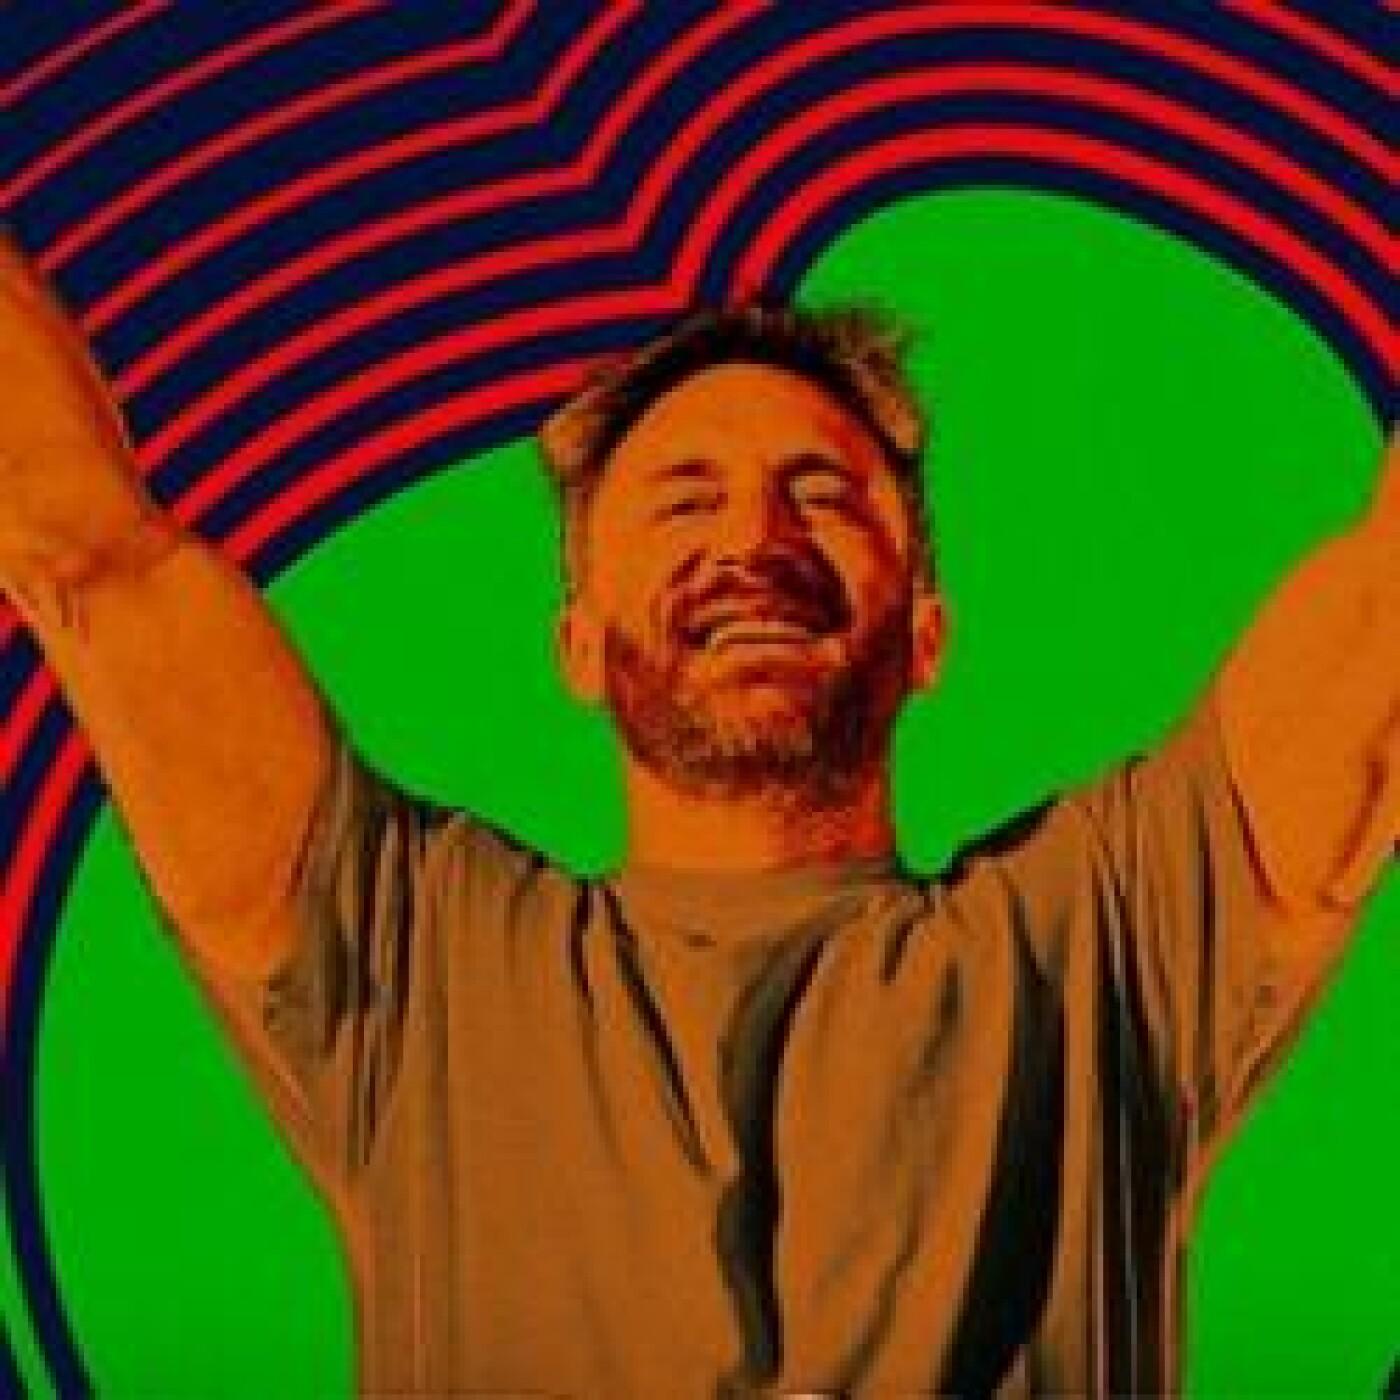 FG MUSIC NEWS : On n'arrête plus David Guetta